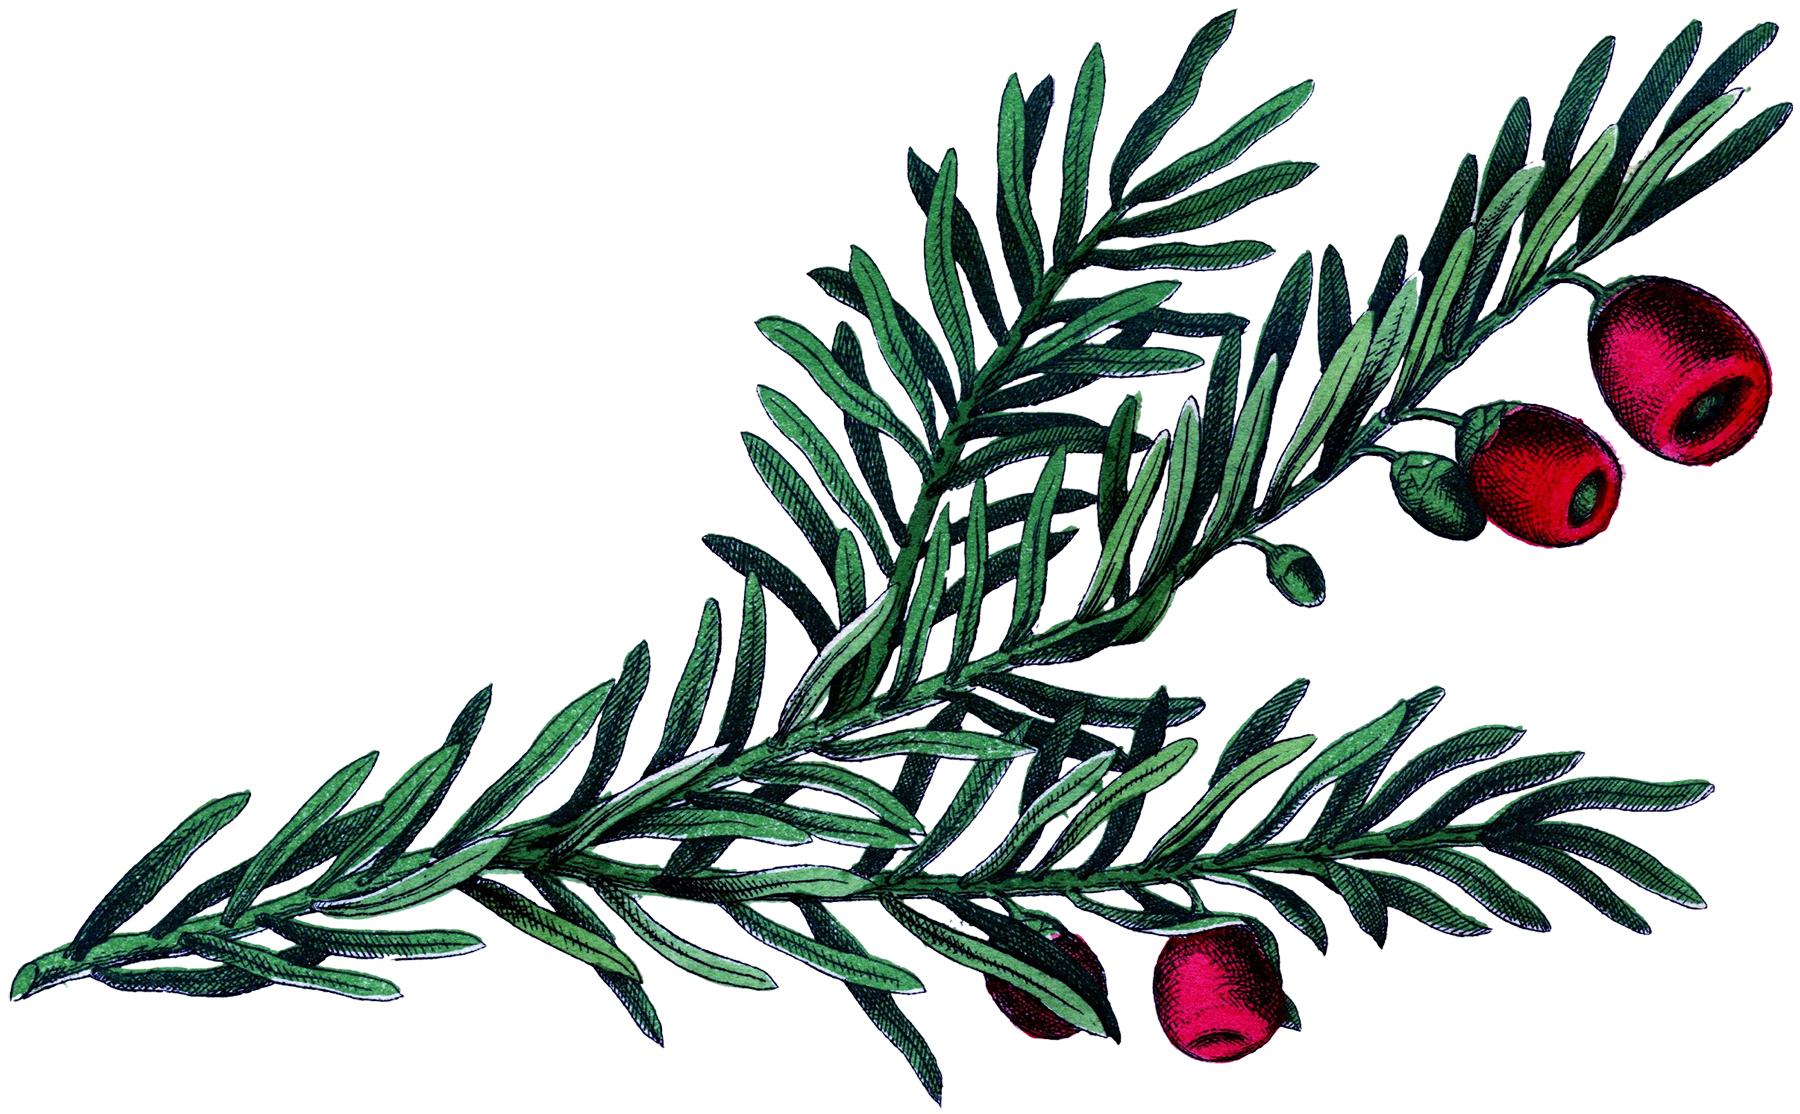 1800x1114 Beautiful Botanical Yew Branch Image!